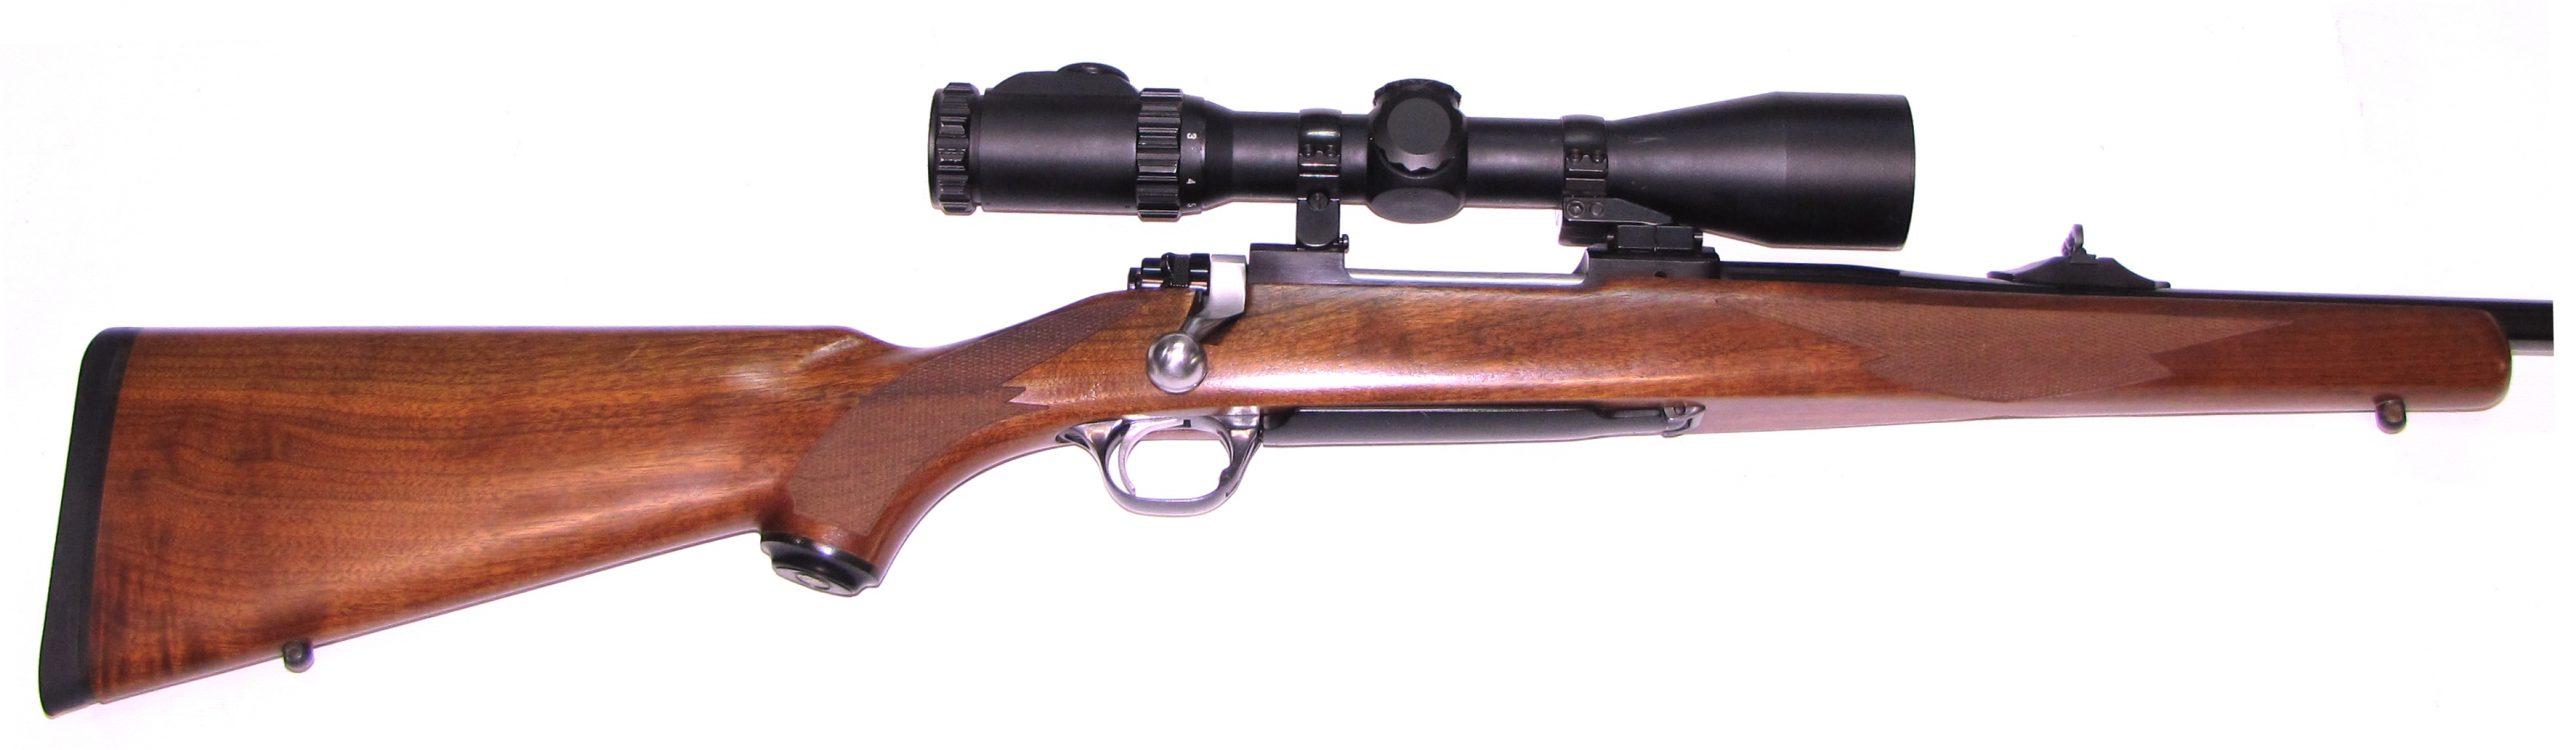 Rifle de cerrojo de caza RUGER M77 MARK II Ref REP2019-772-armeriaiberica-2